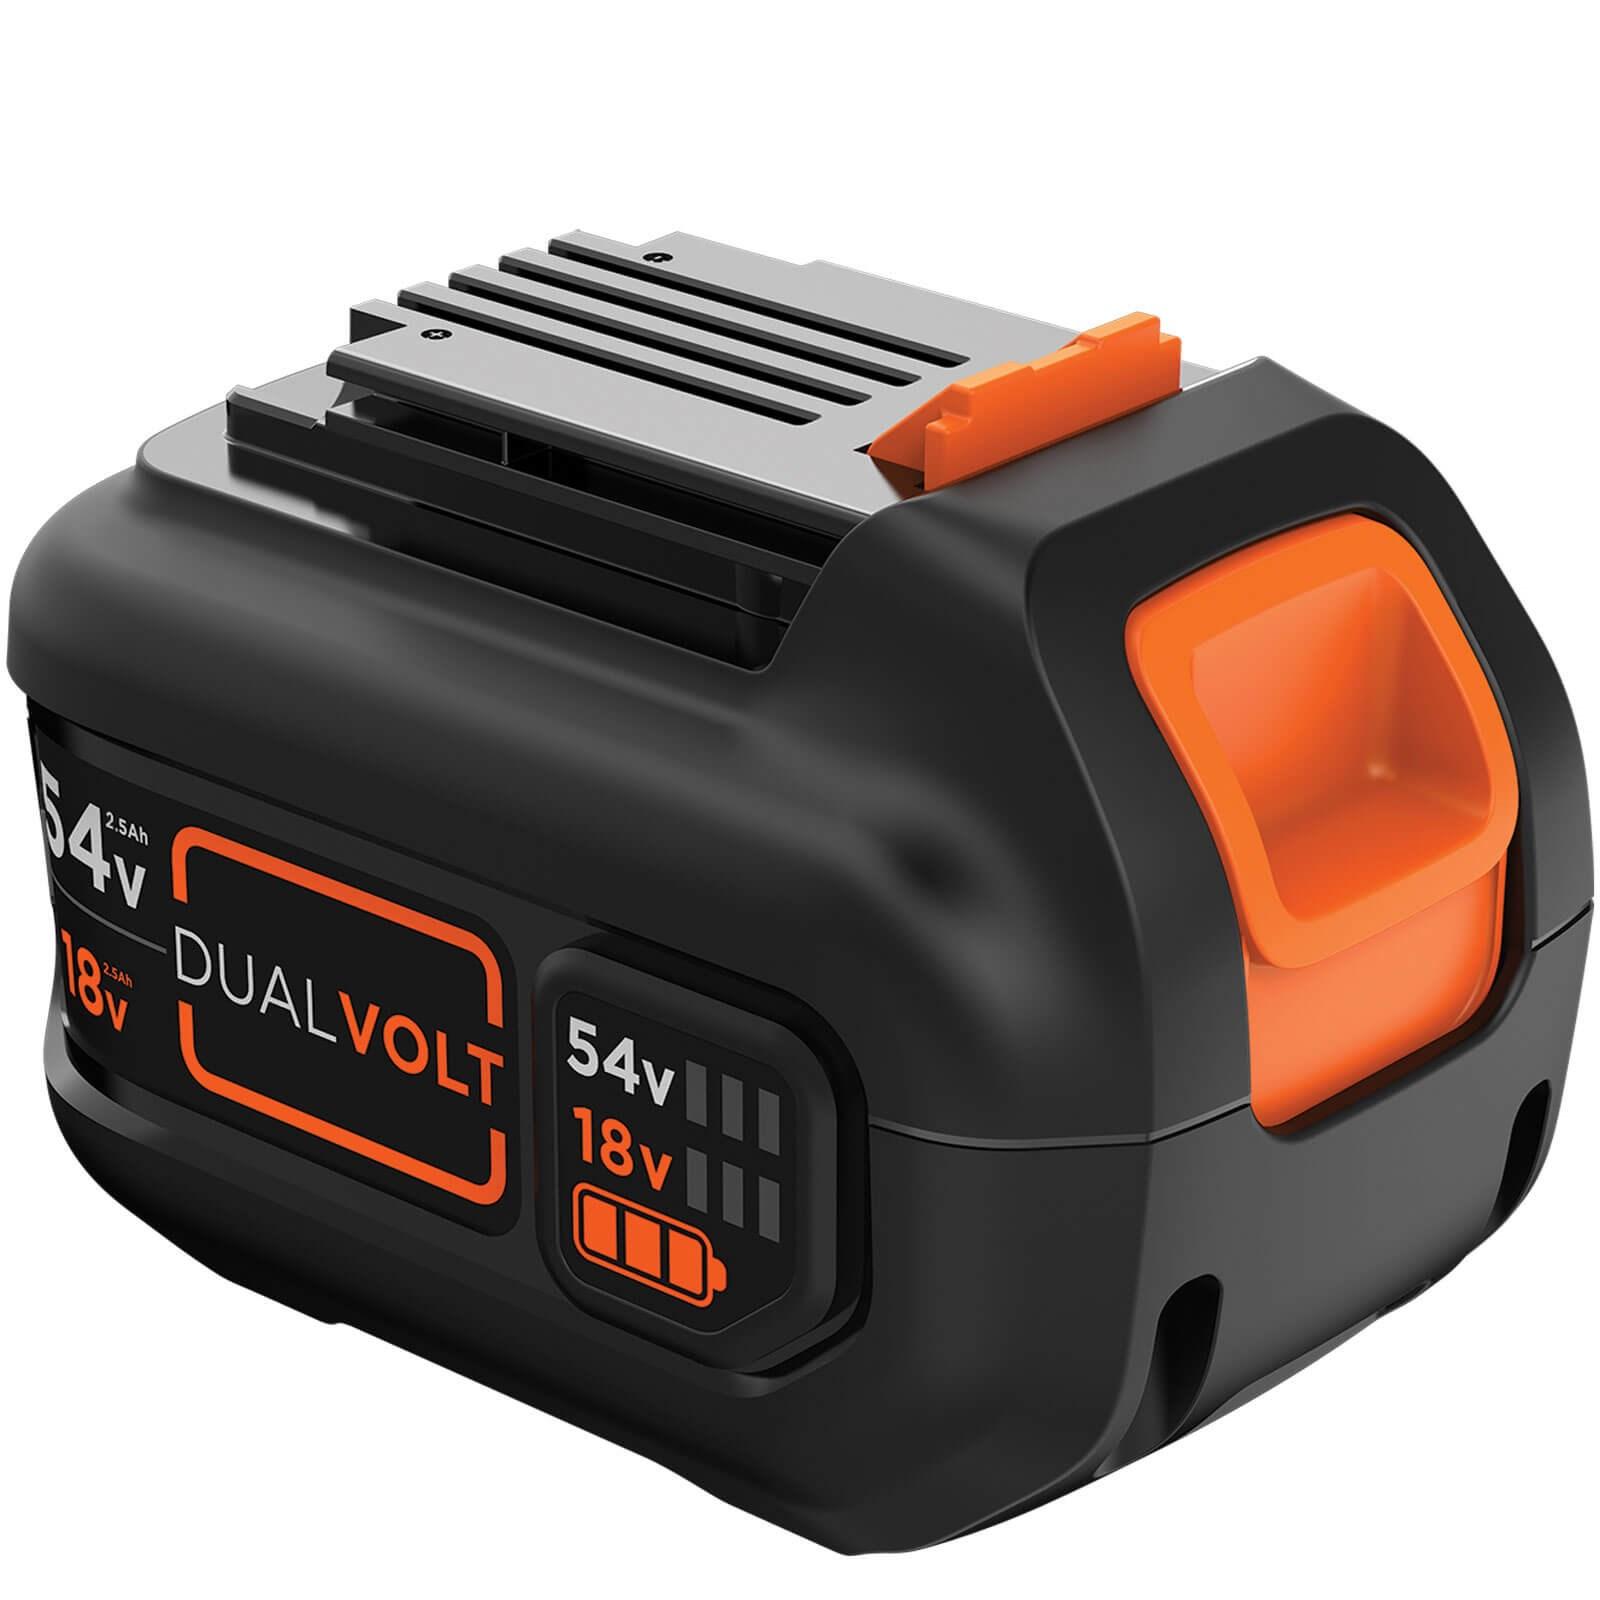 Groovy Black & Decker Genuine BL2554 54v Cordless Li-ion Battery 2.5ah YV79